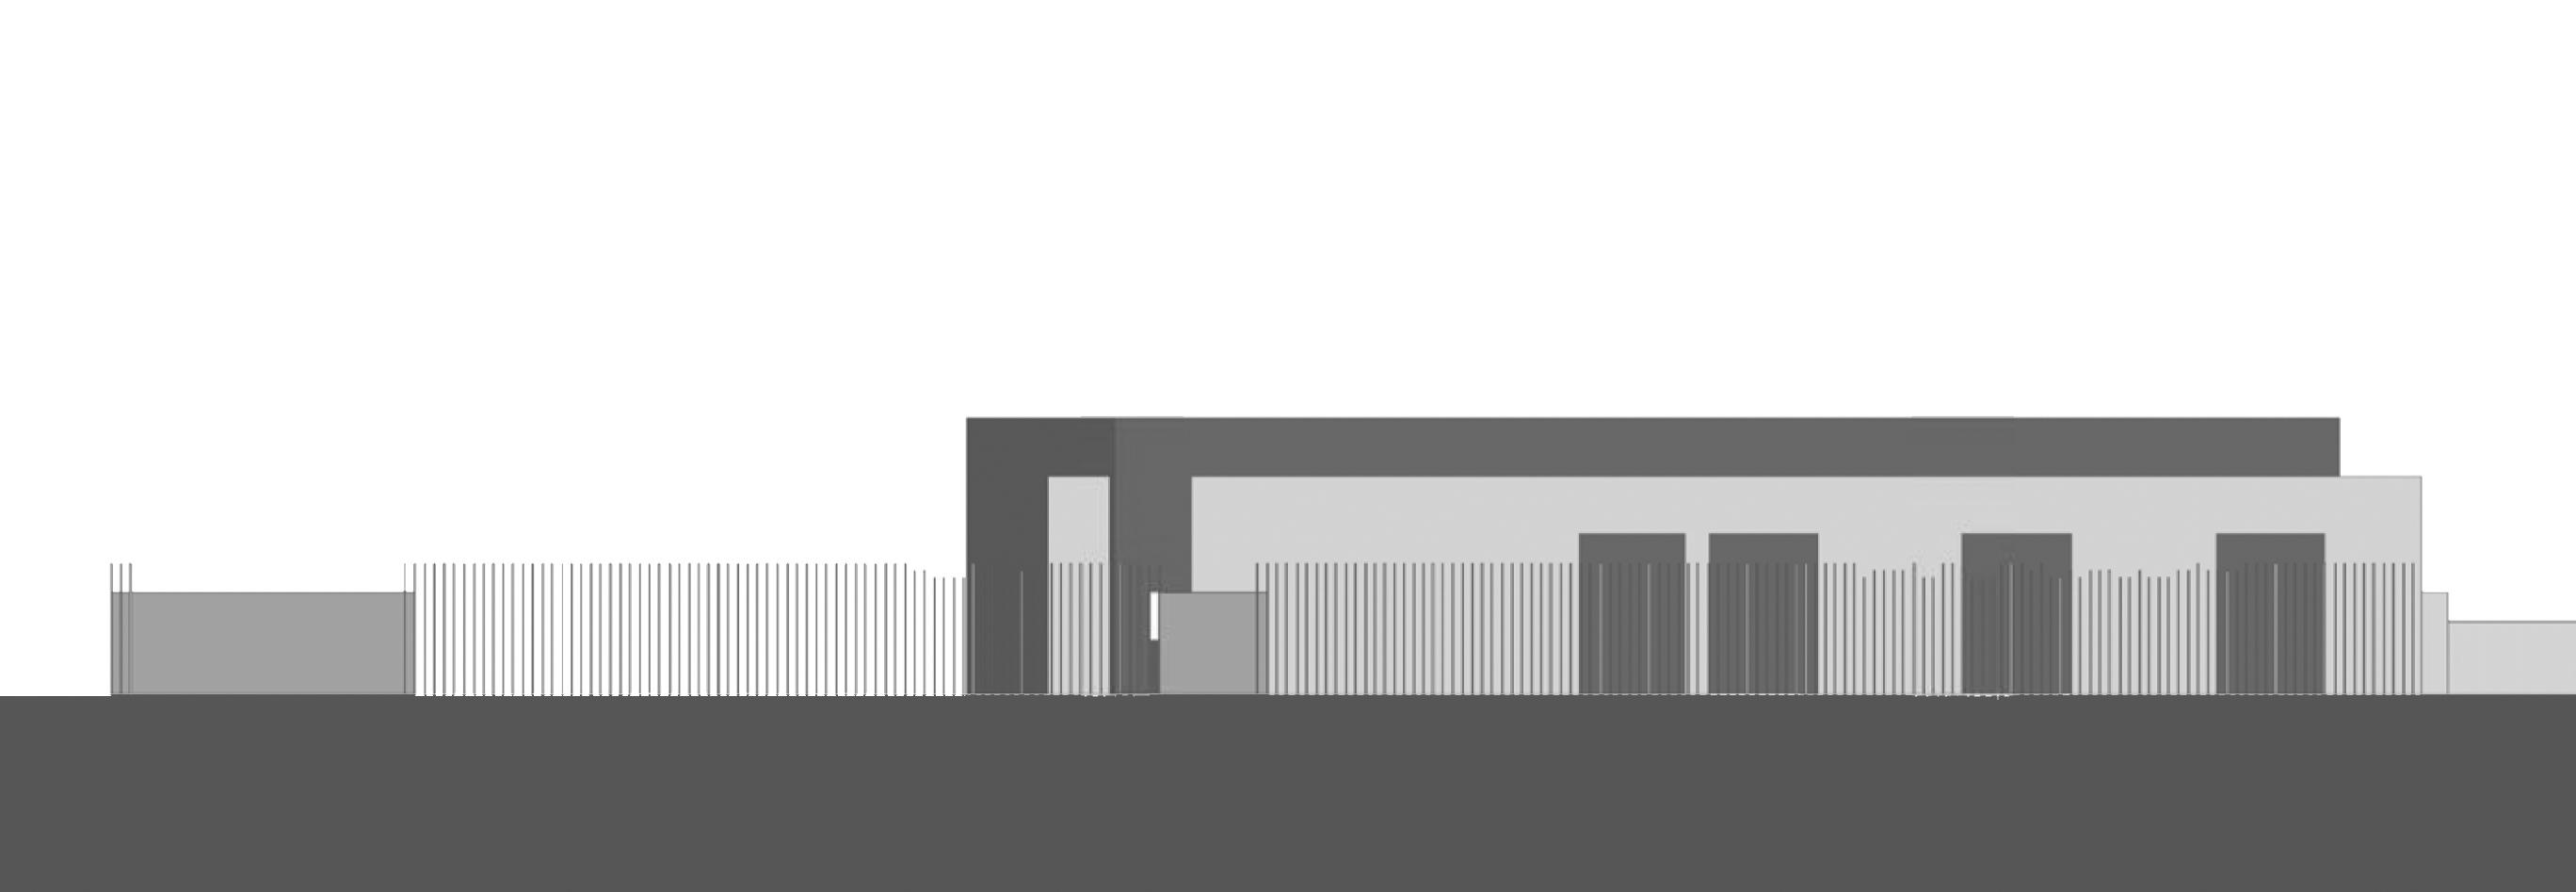 20050618-muro-3d Layout2 (1) copy1pb